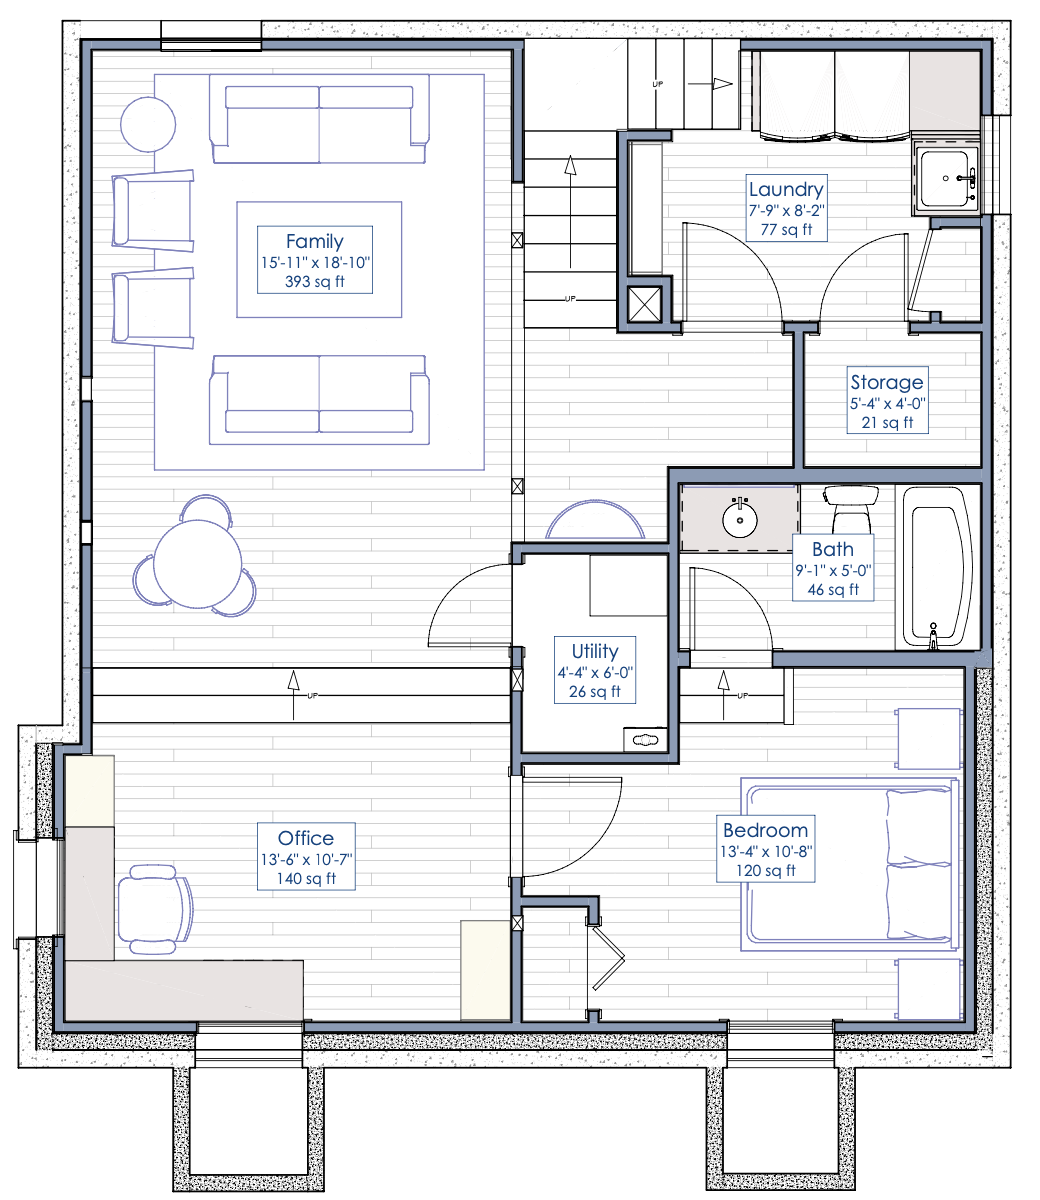 basement remodel floorplan